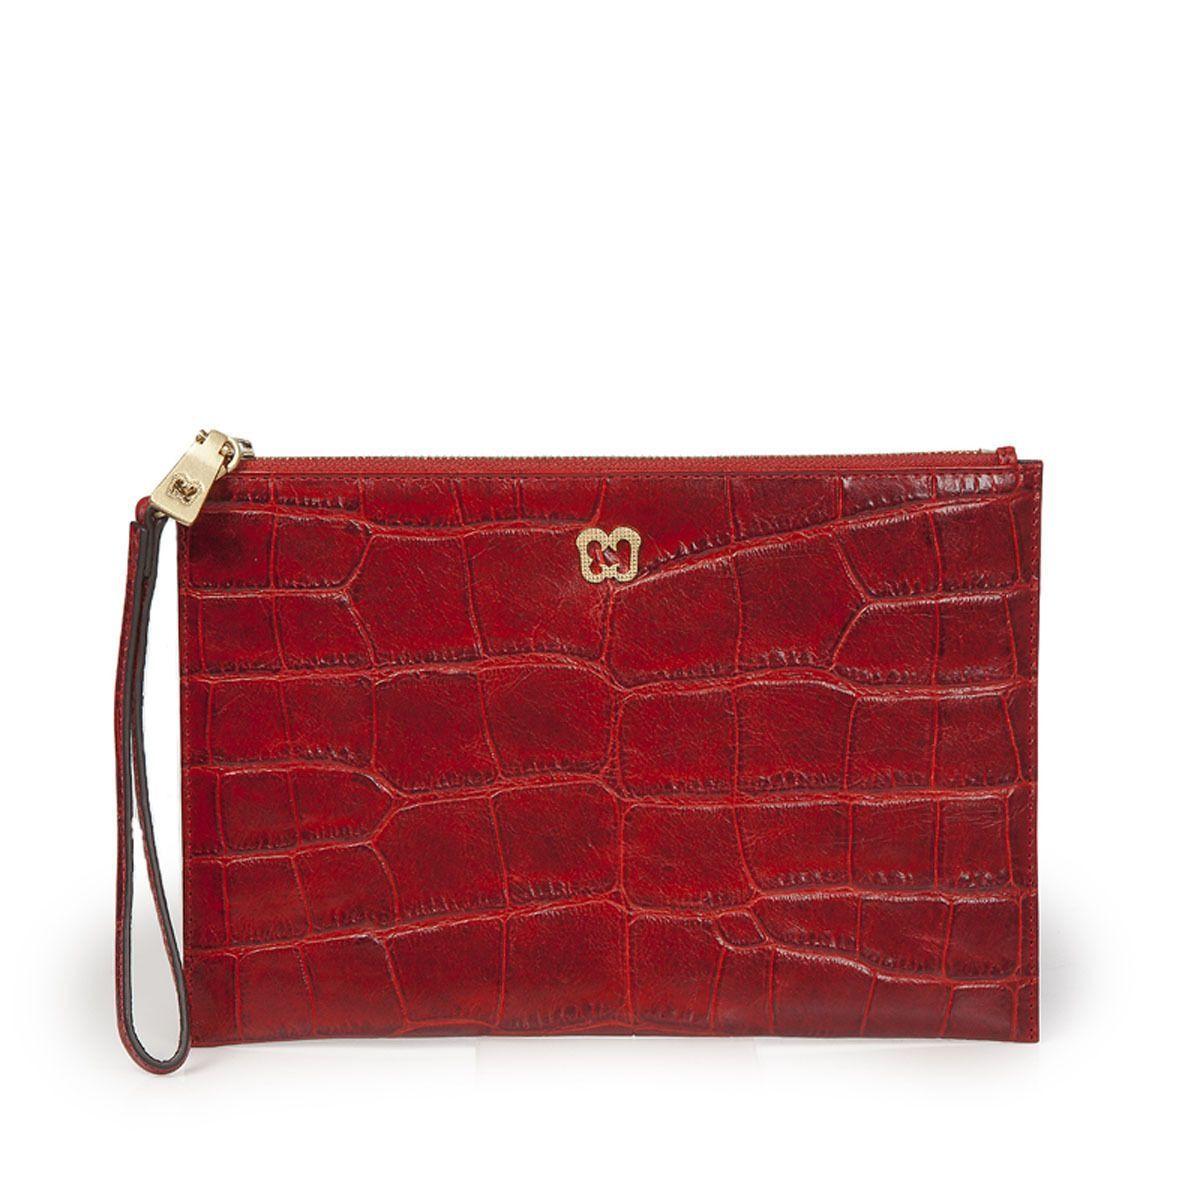 44e5a2430f3974 Eric Javits Luxury Fashion Designer Women'S Handbag - Flat Zip Clutch - Red